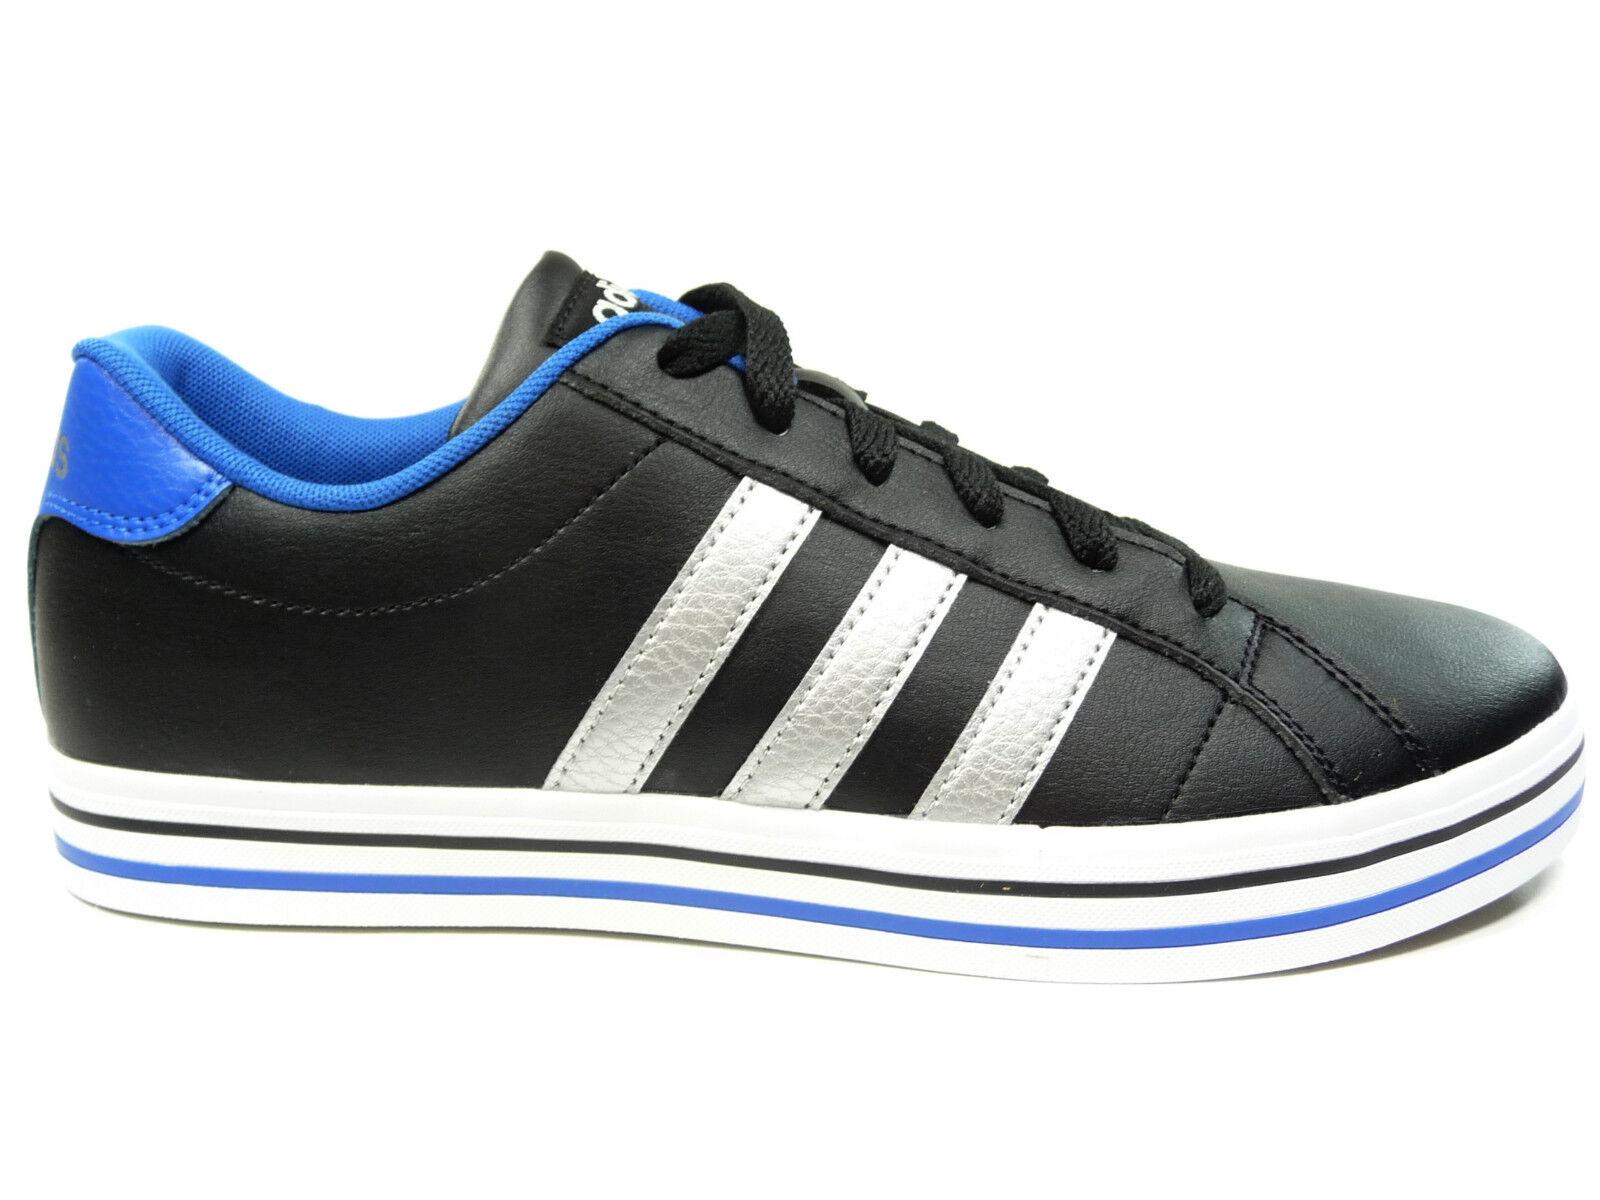 Adidas Neo Schwarz Herrenhalbschuhe Sport Retro Sneaker in Schwarz Neo Silber WEEKLY AW5197 e589ad